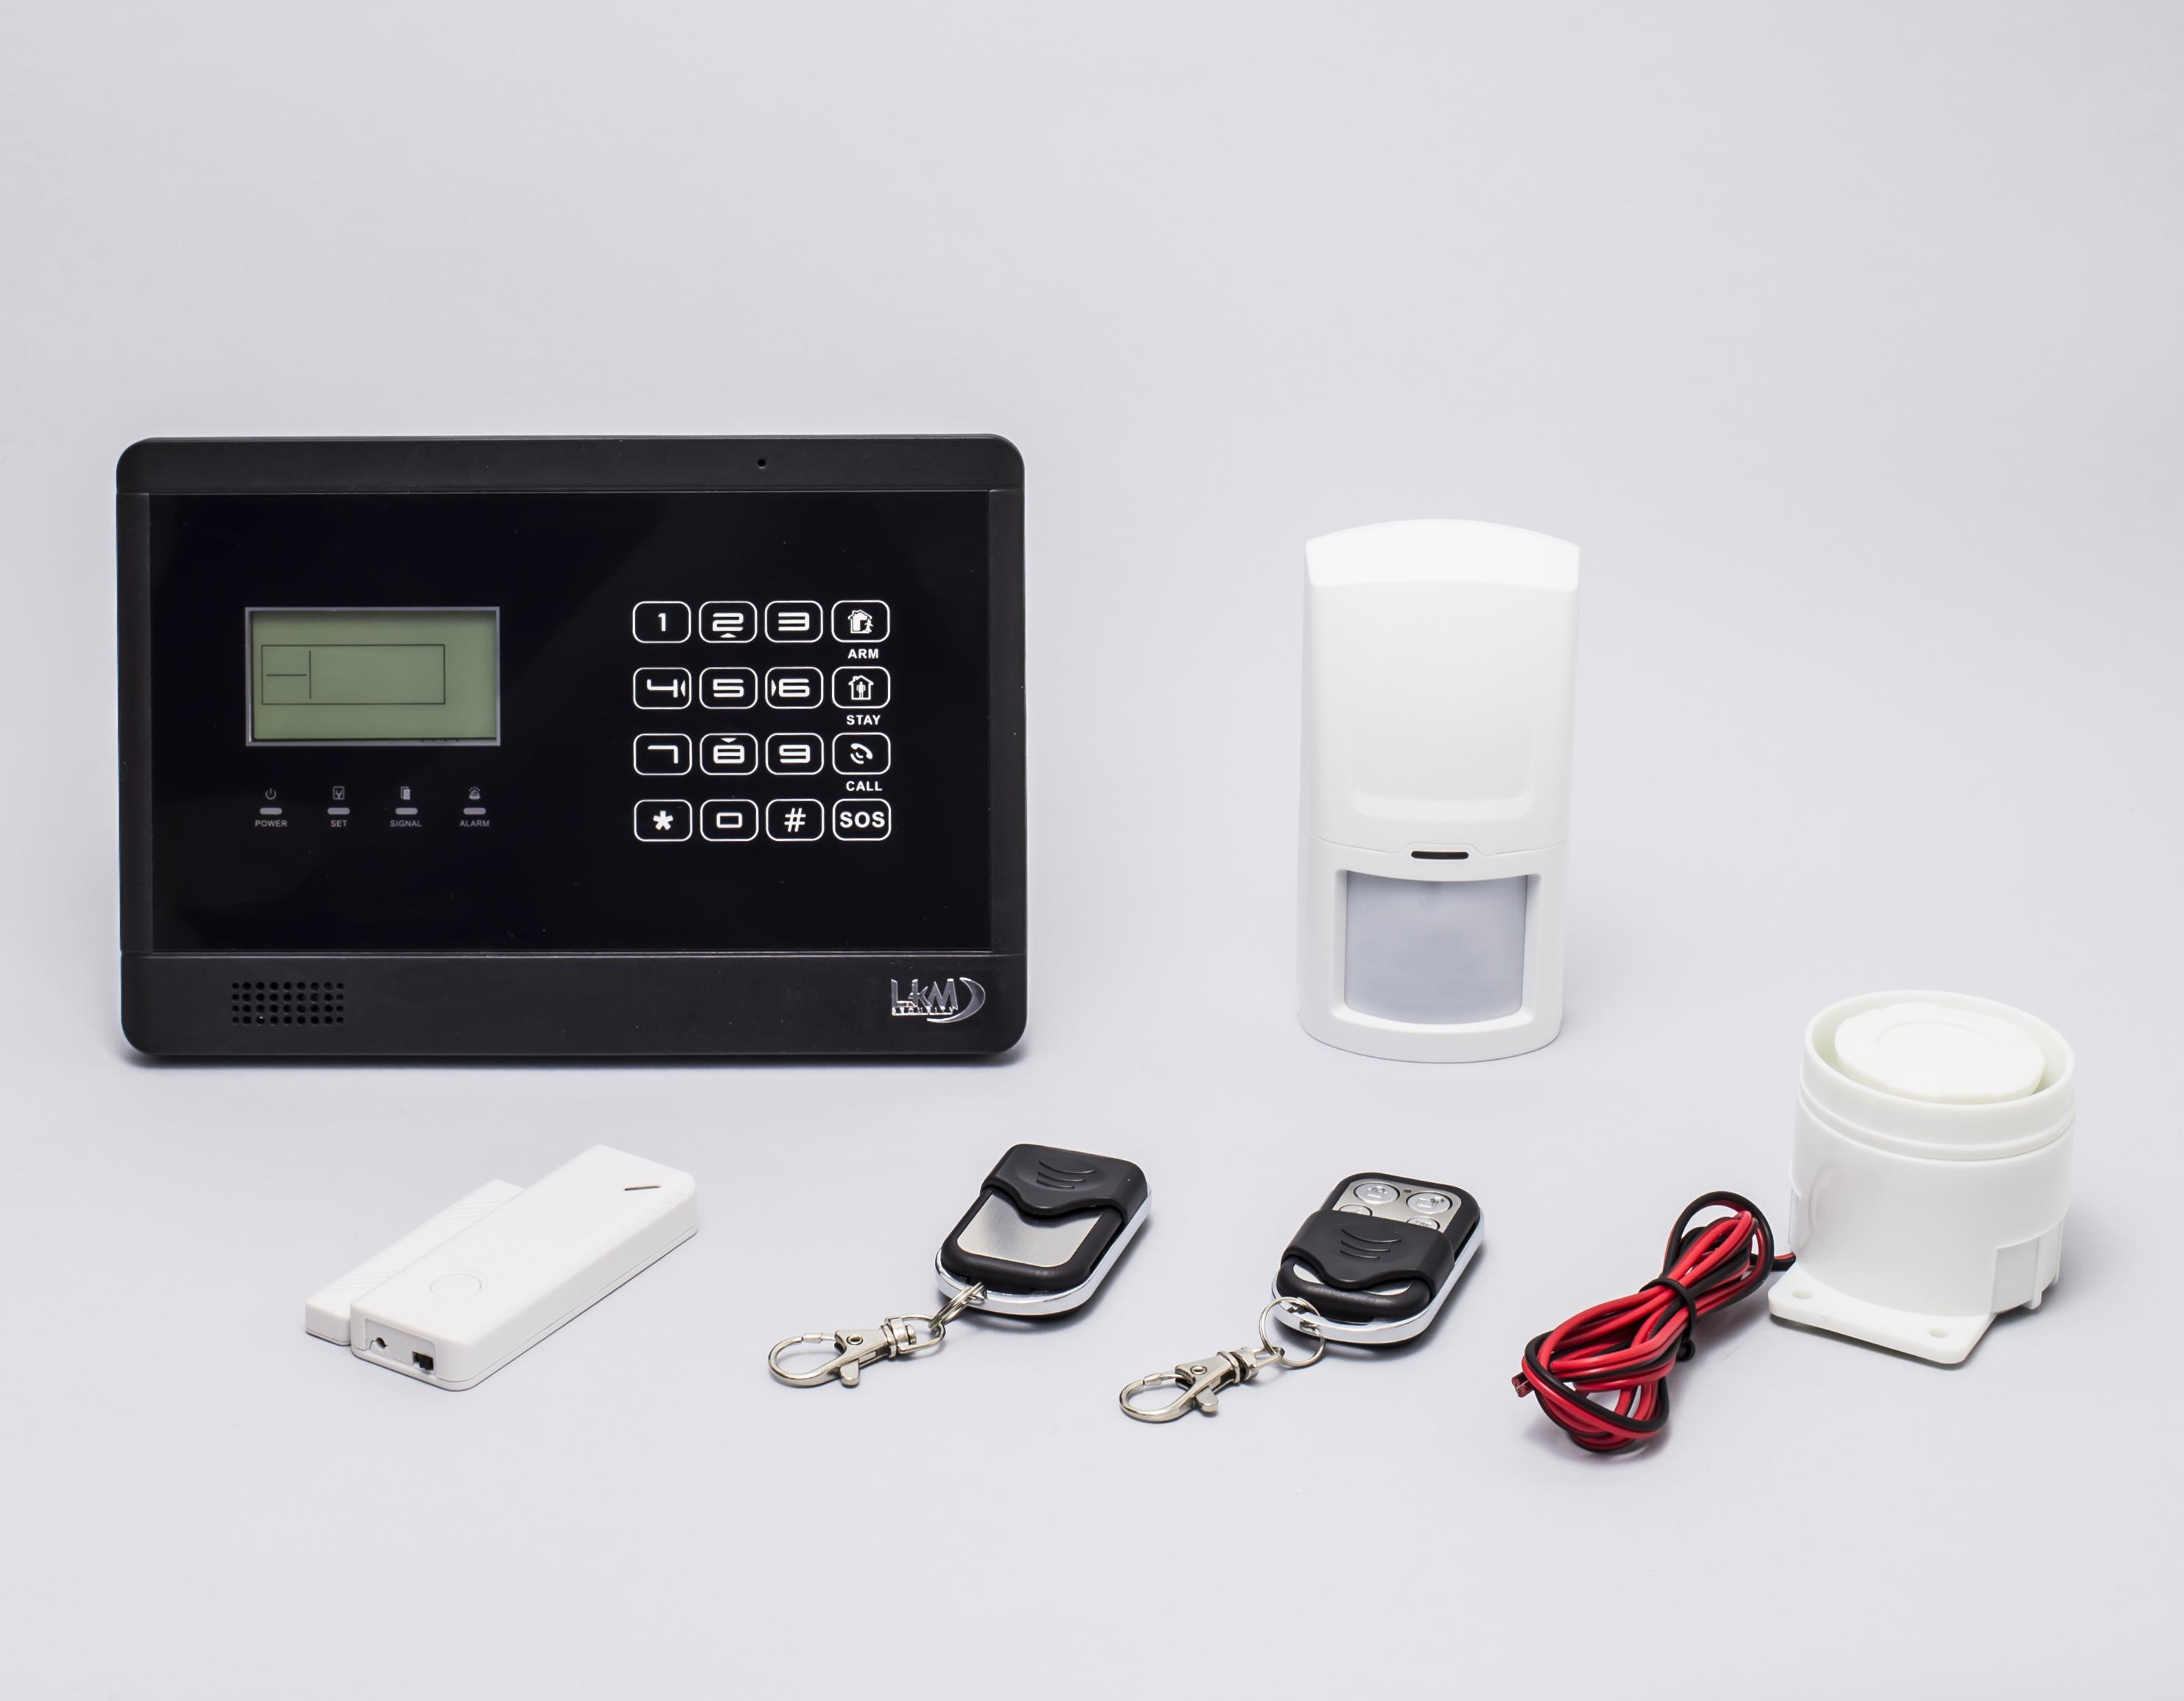 Allarme casa lkm security antifurto wireless senza wg yl007m2e - Allarme casa wireless ...